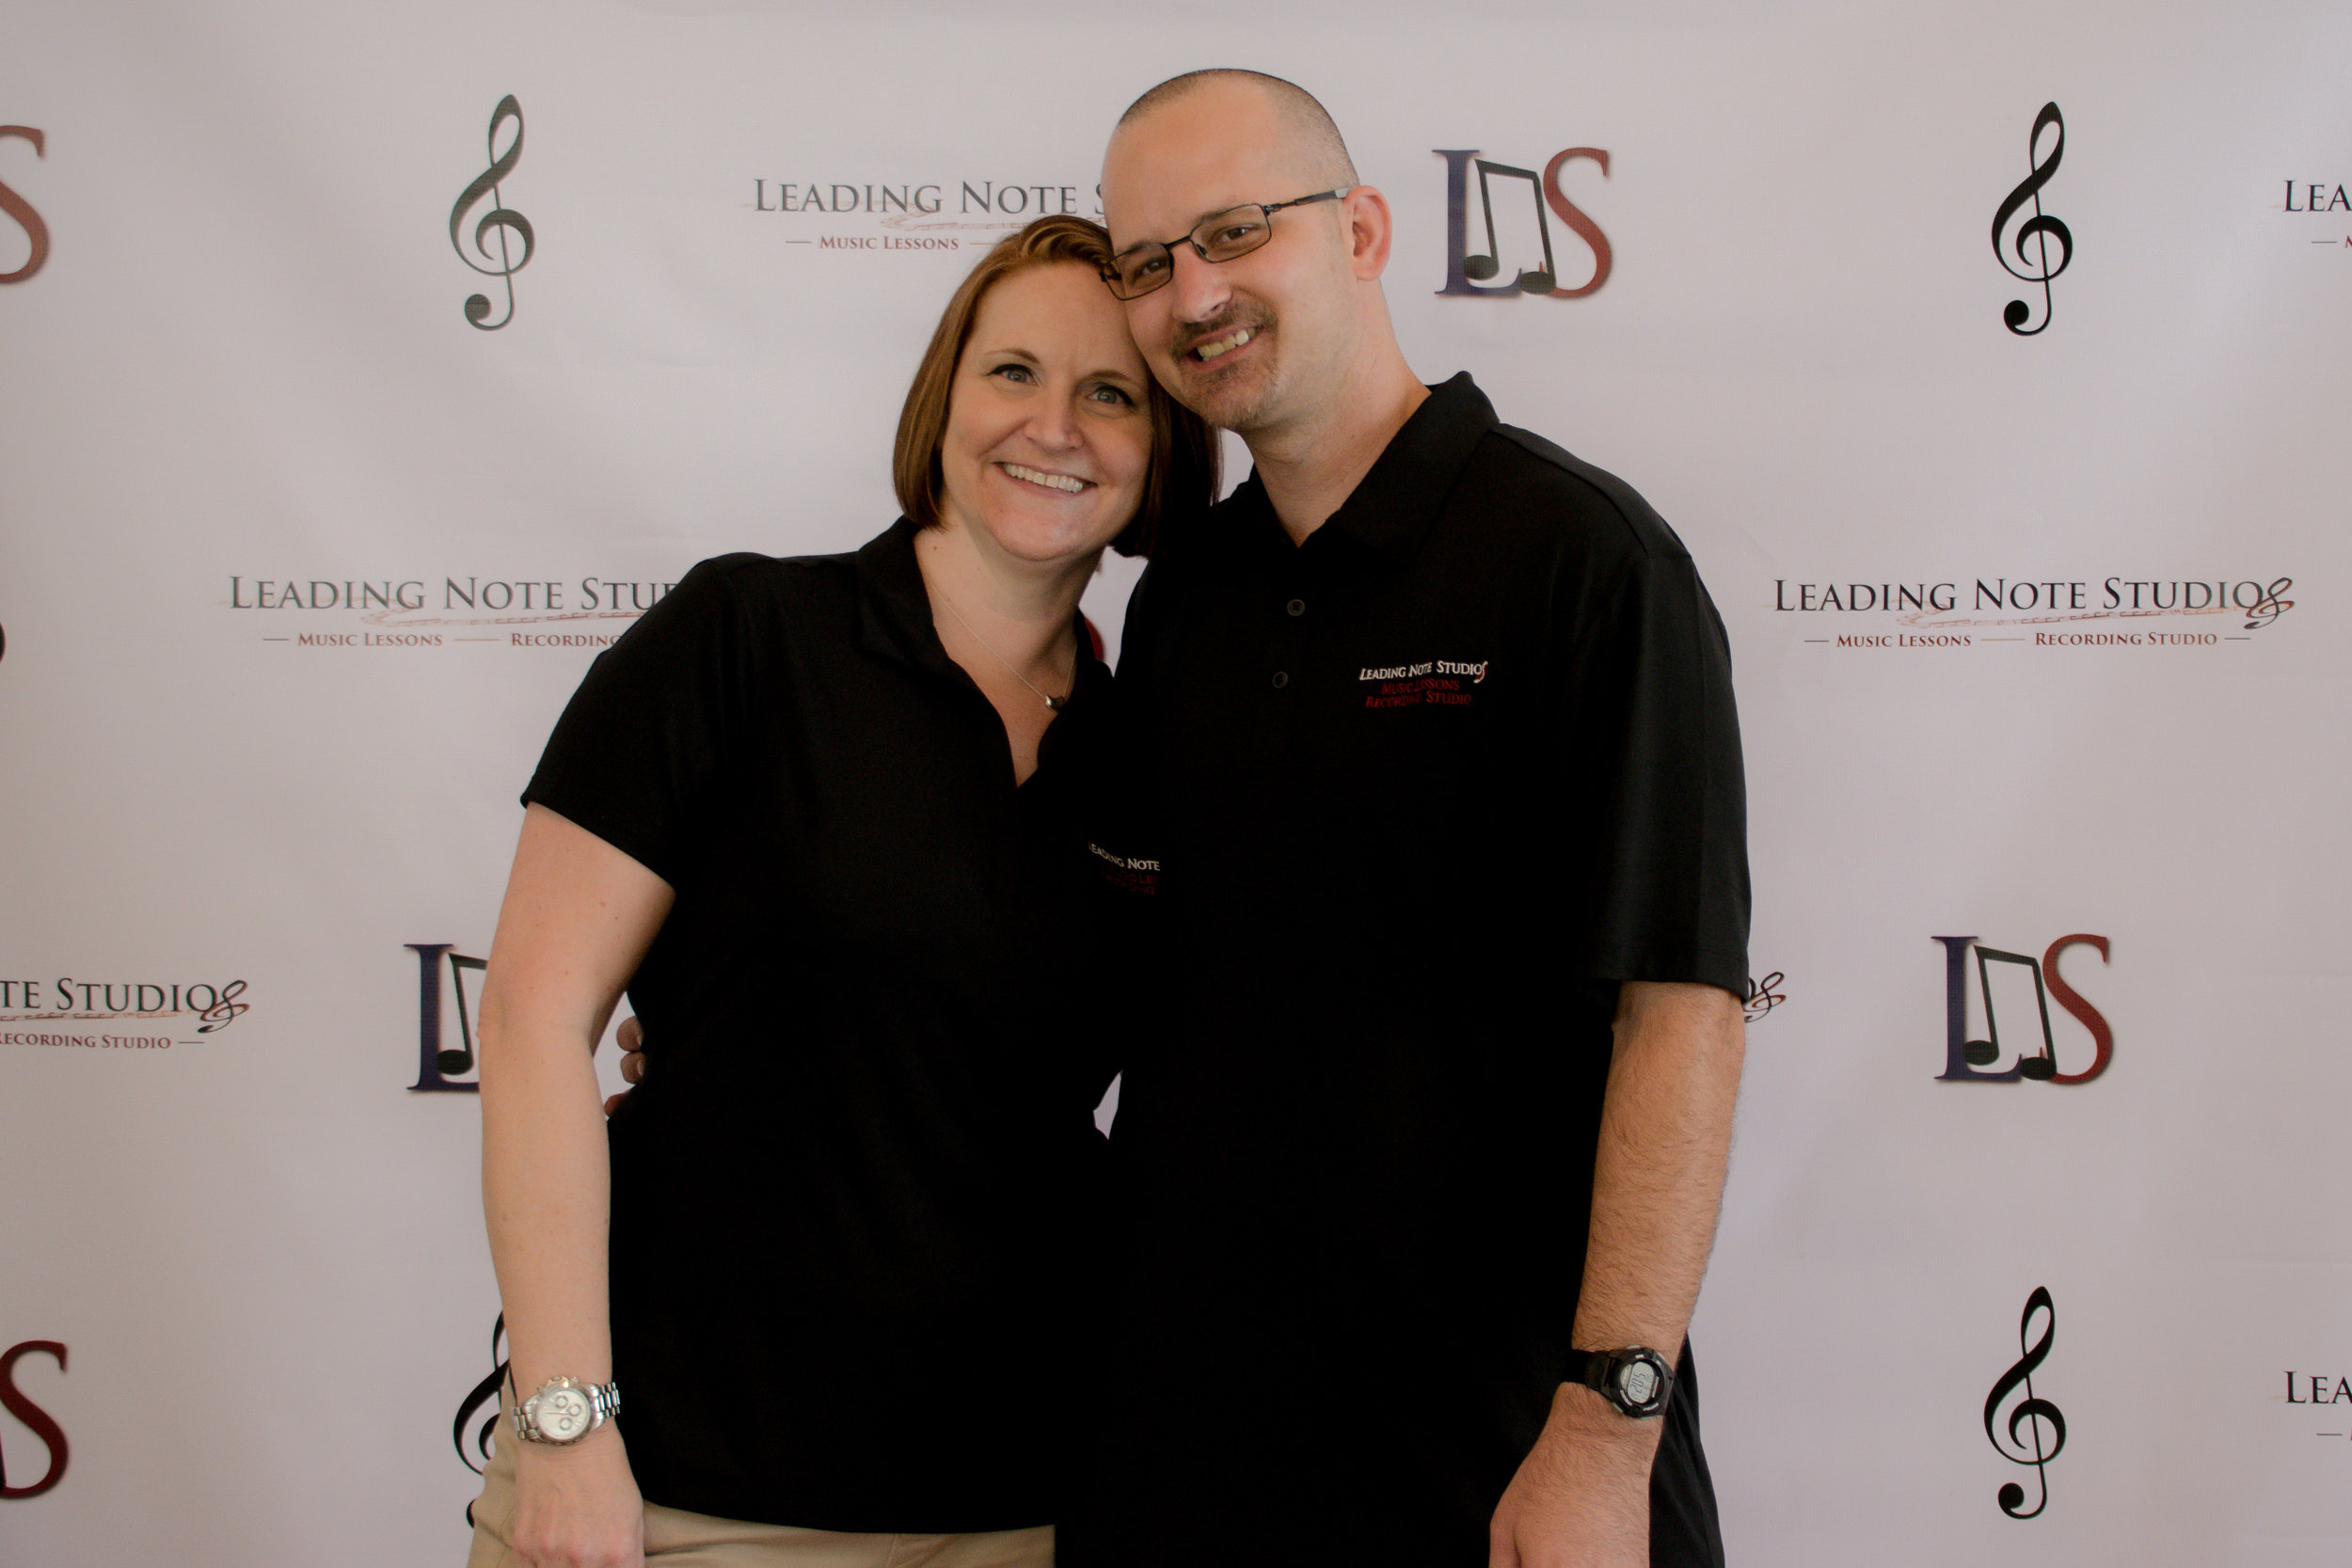 Nancy Graham & Chris Tillman (photographer)